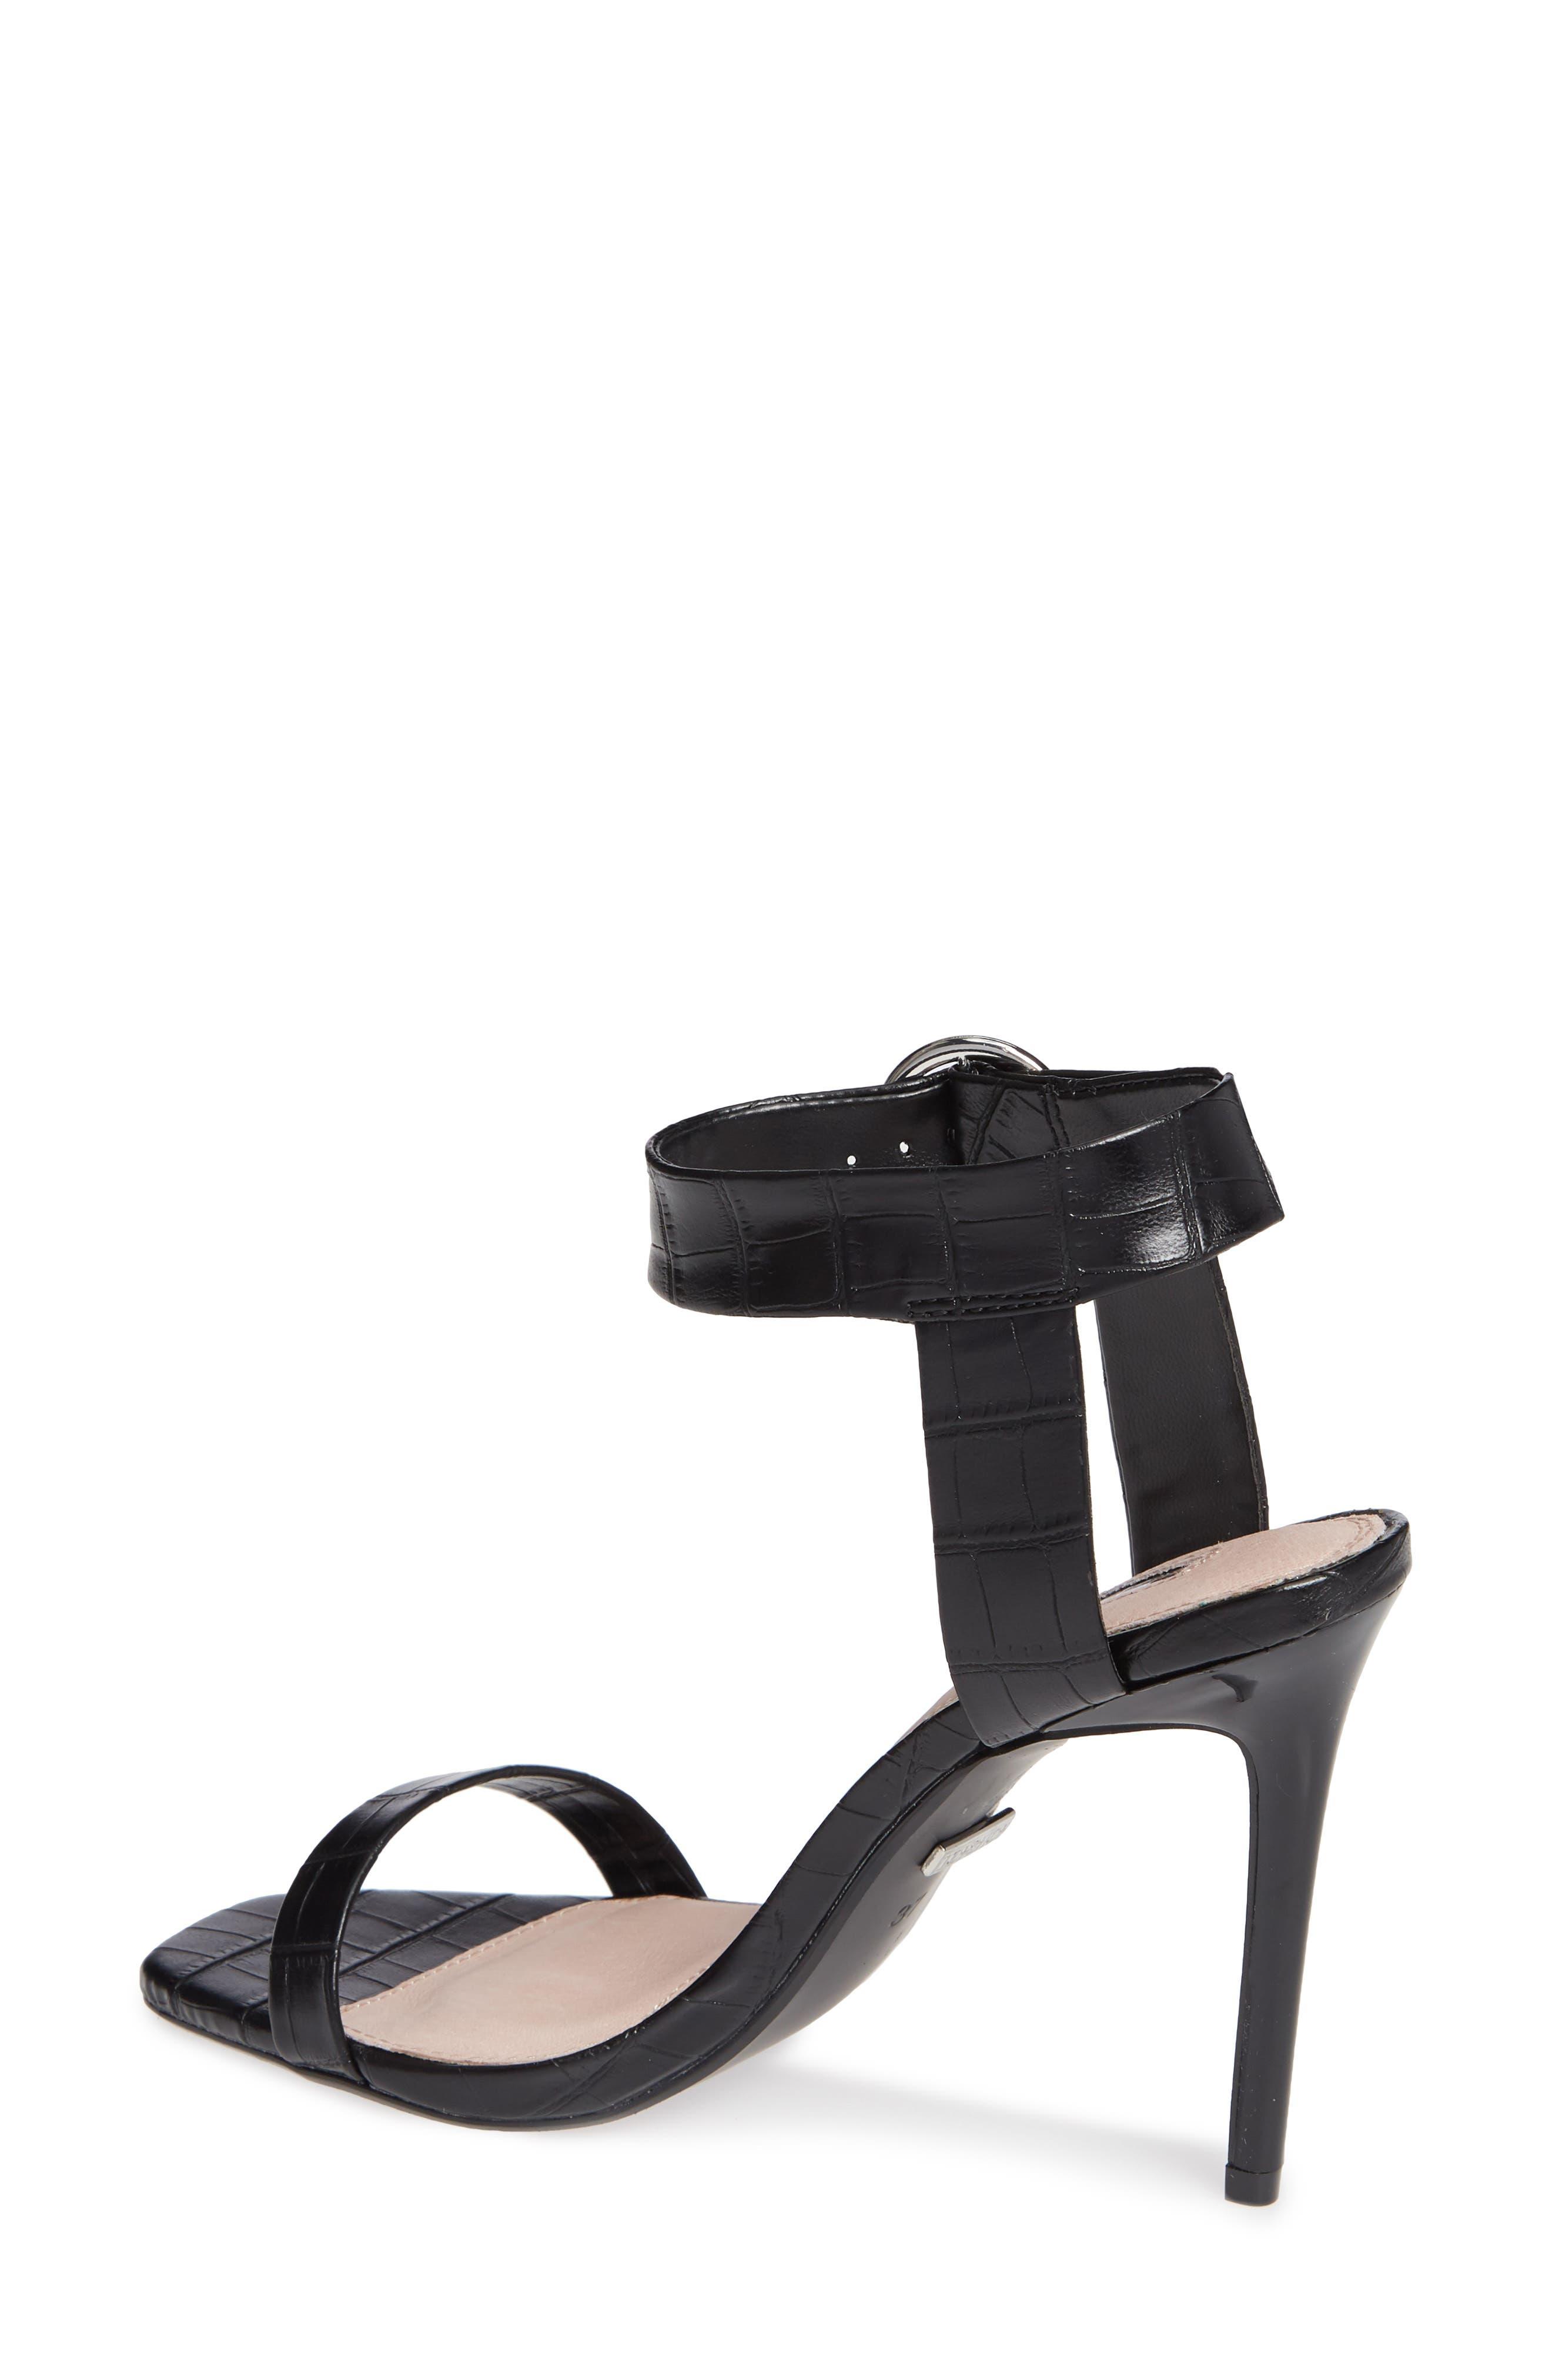 Ria Ankle Cuff Sandal,                             Alternate thumbnail 2, color,                             BLACK